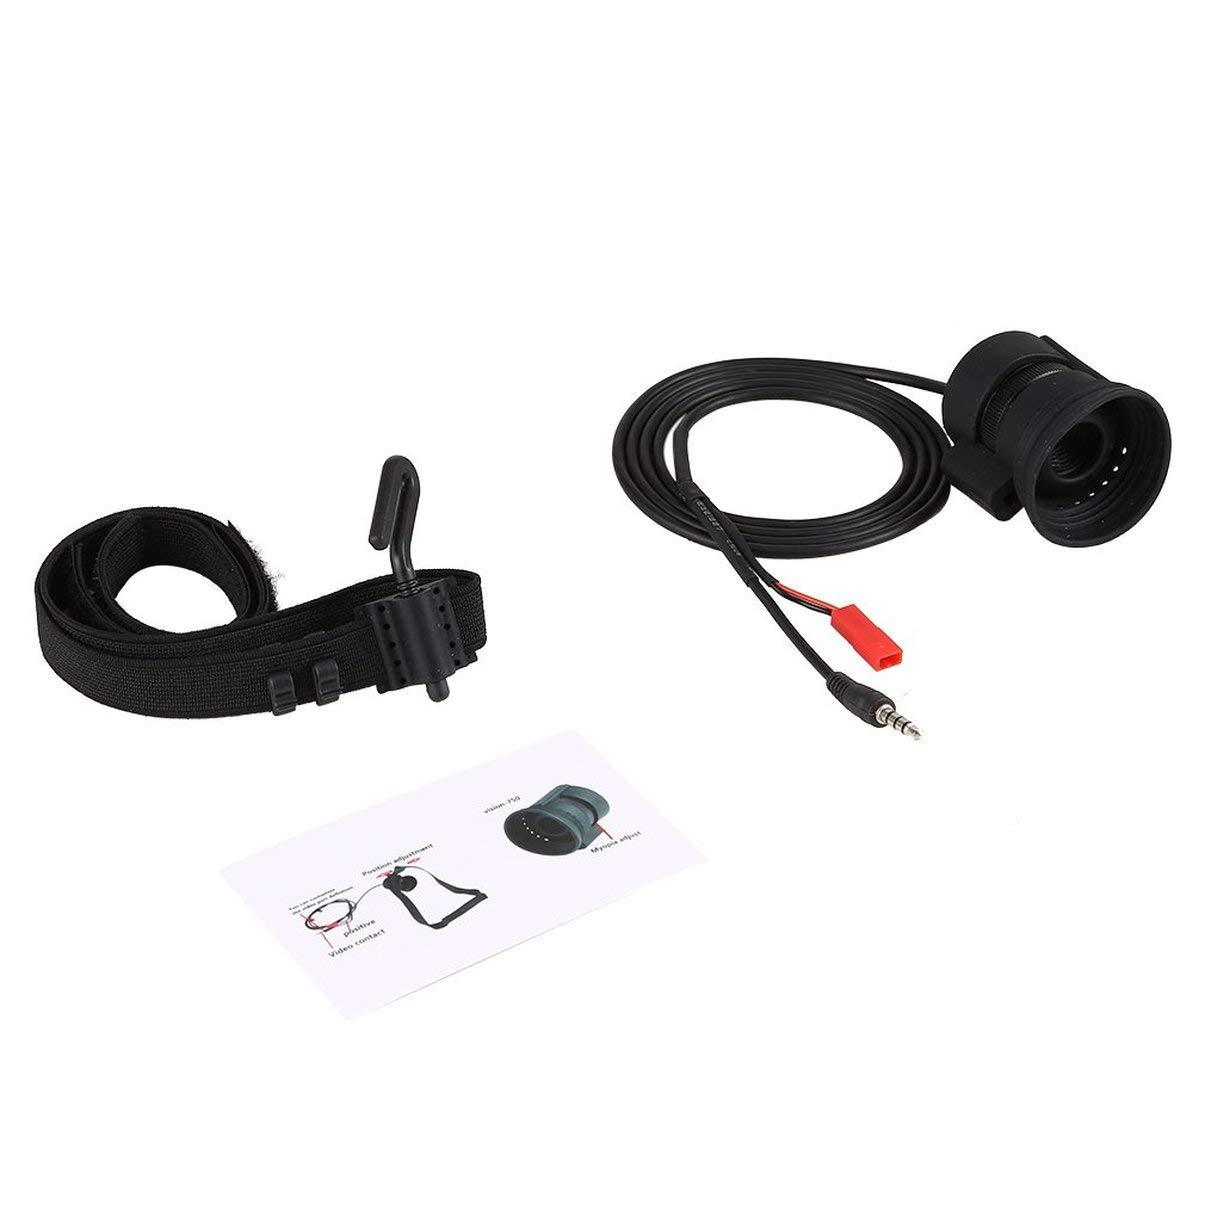 JullyeleDEgant 5.8G Monokulare Displayer mit Gürtel RGB 854  540 HD LCD Monitor FPV Videogläser für RC Drone 750 Version Myopie Adjust